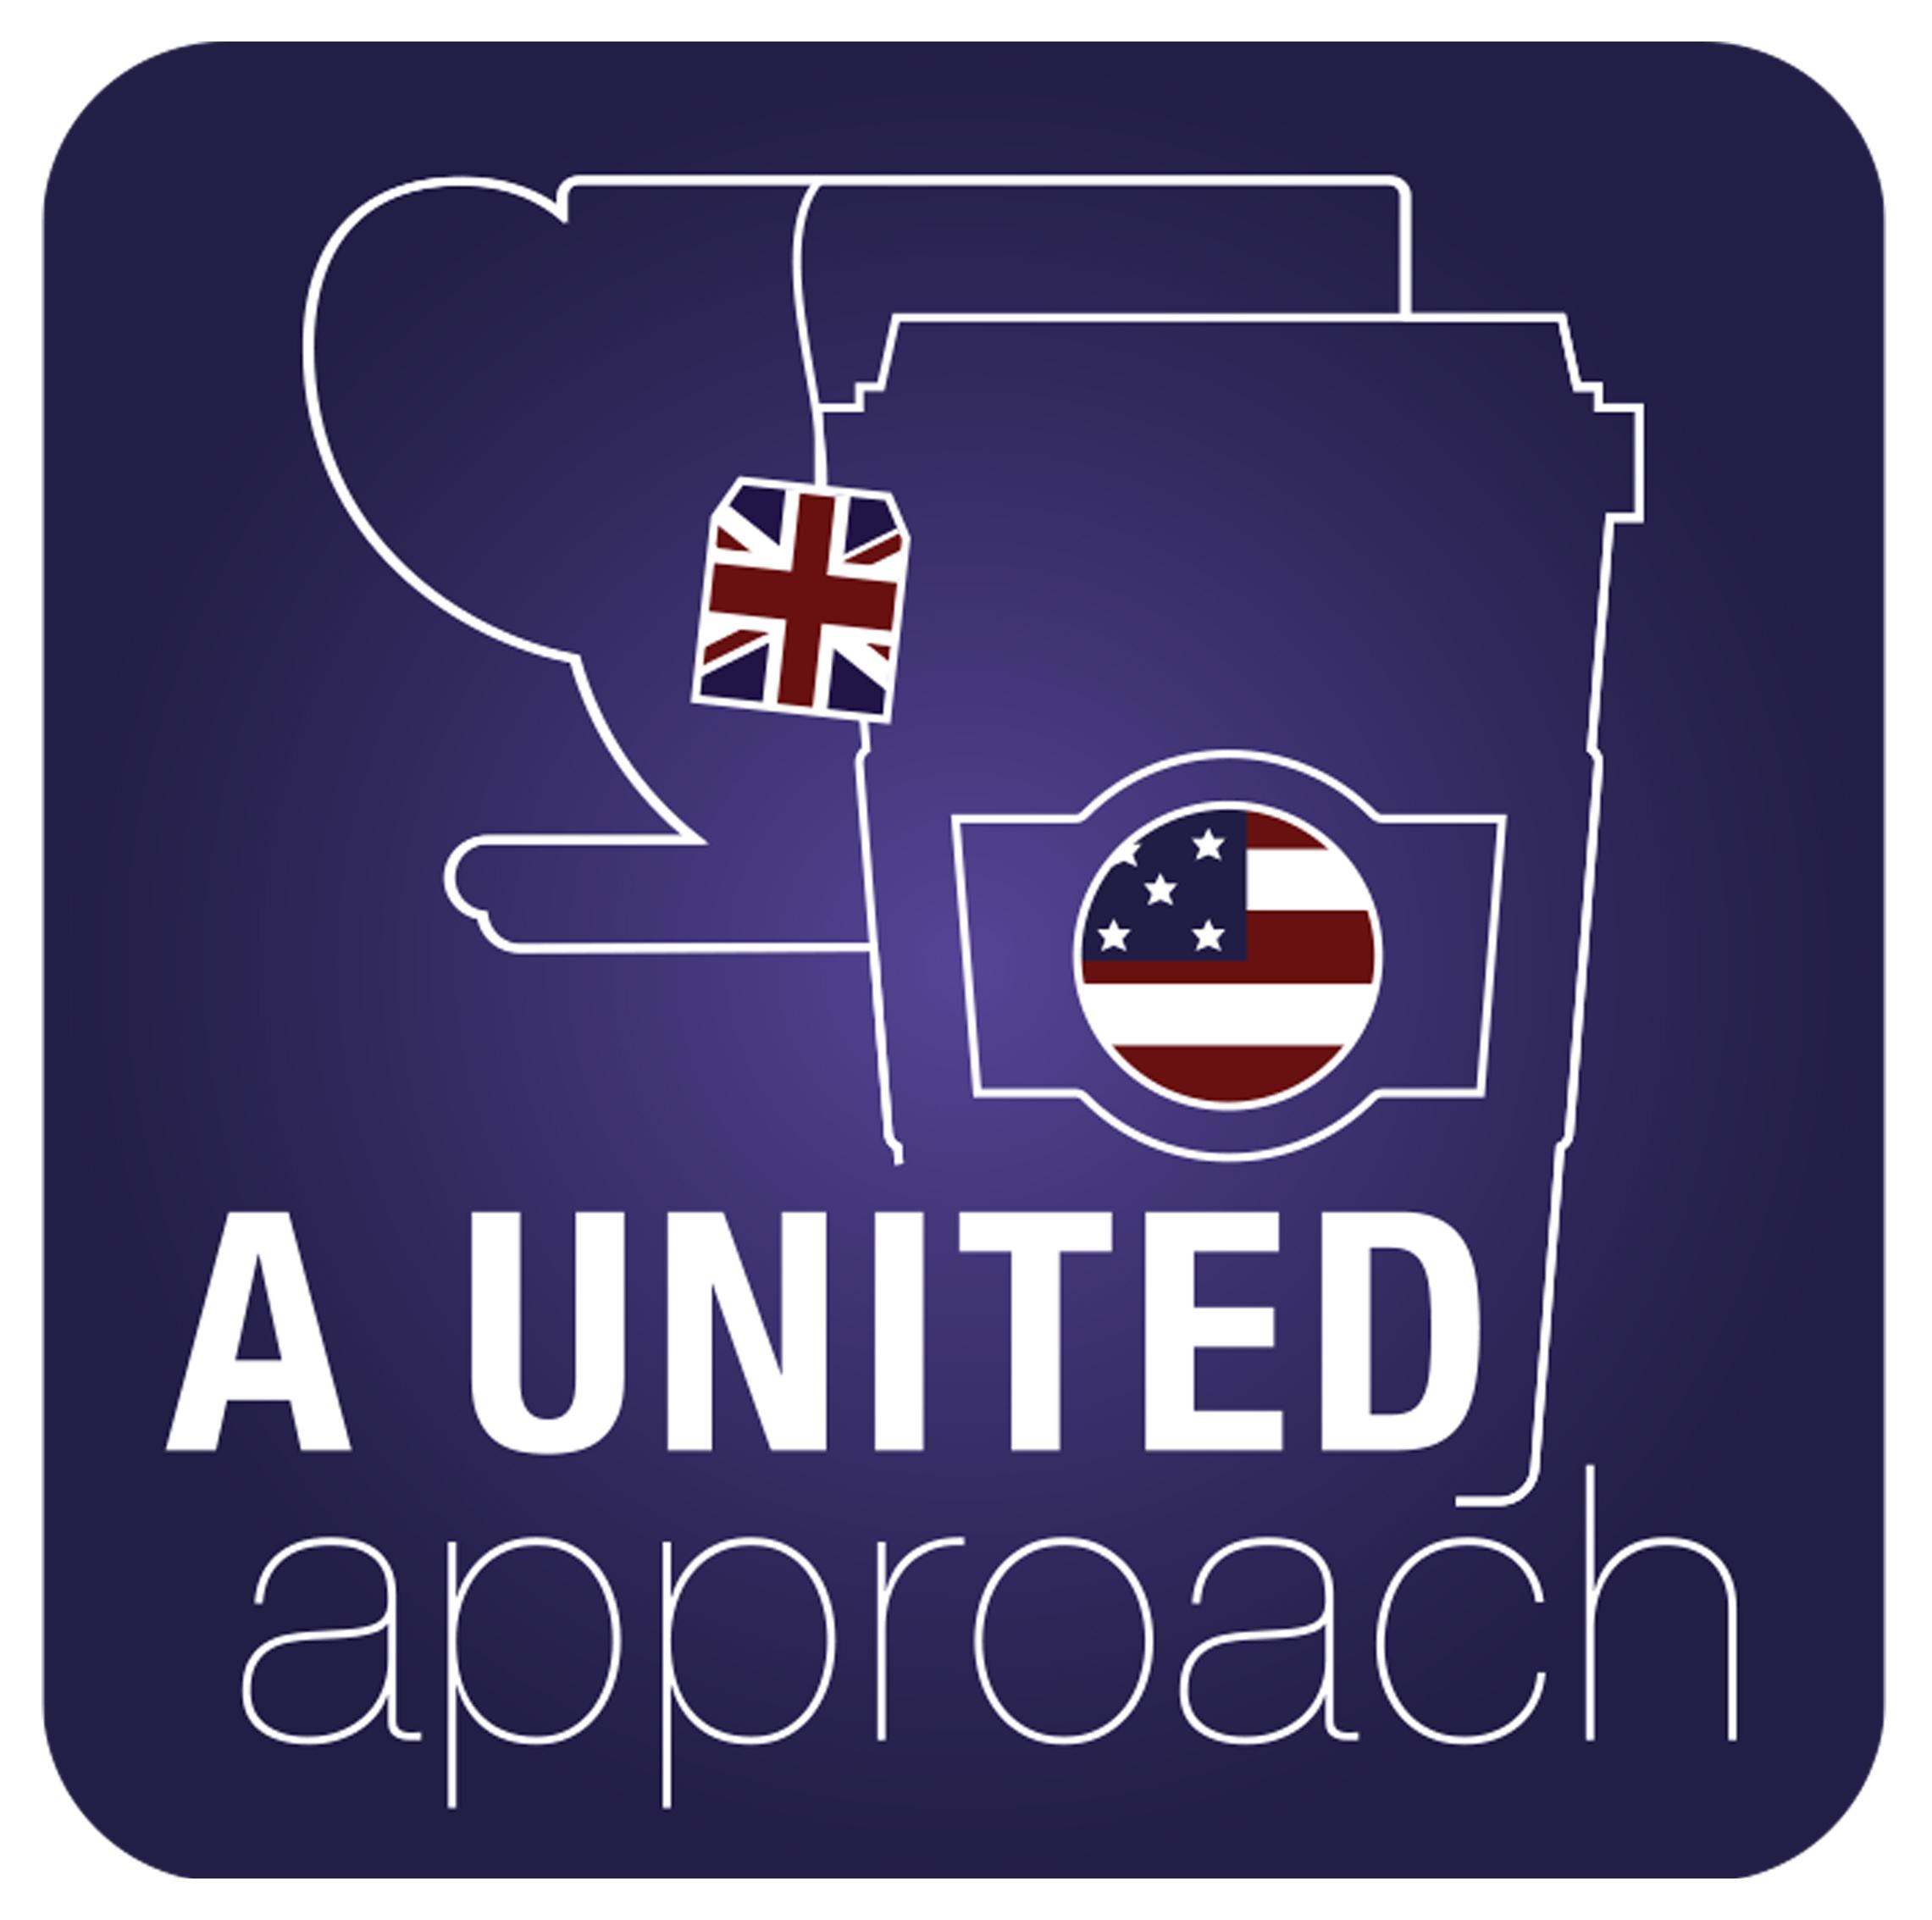 AUnitedApproachpodcast